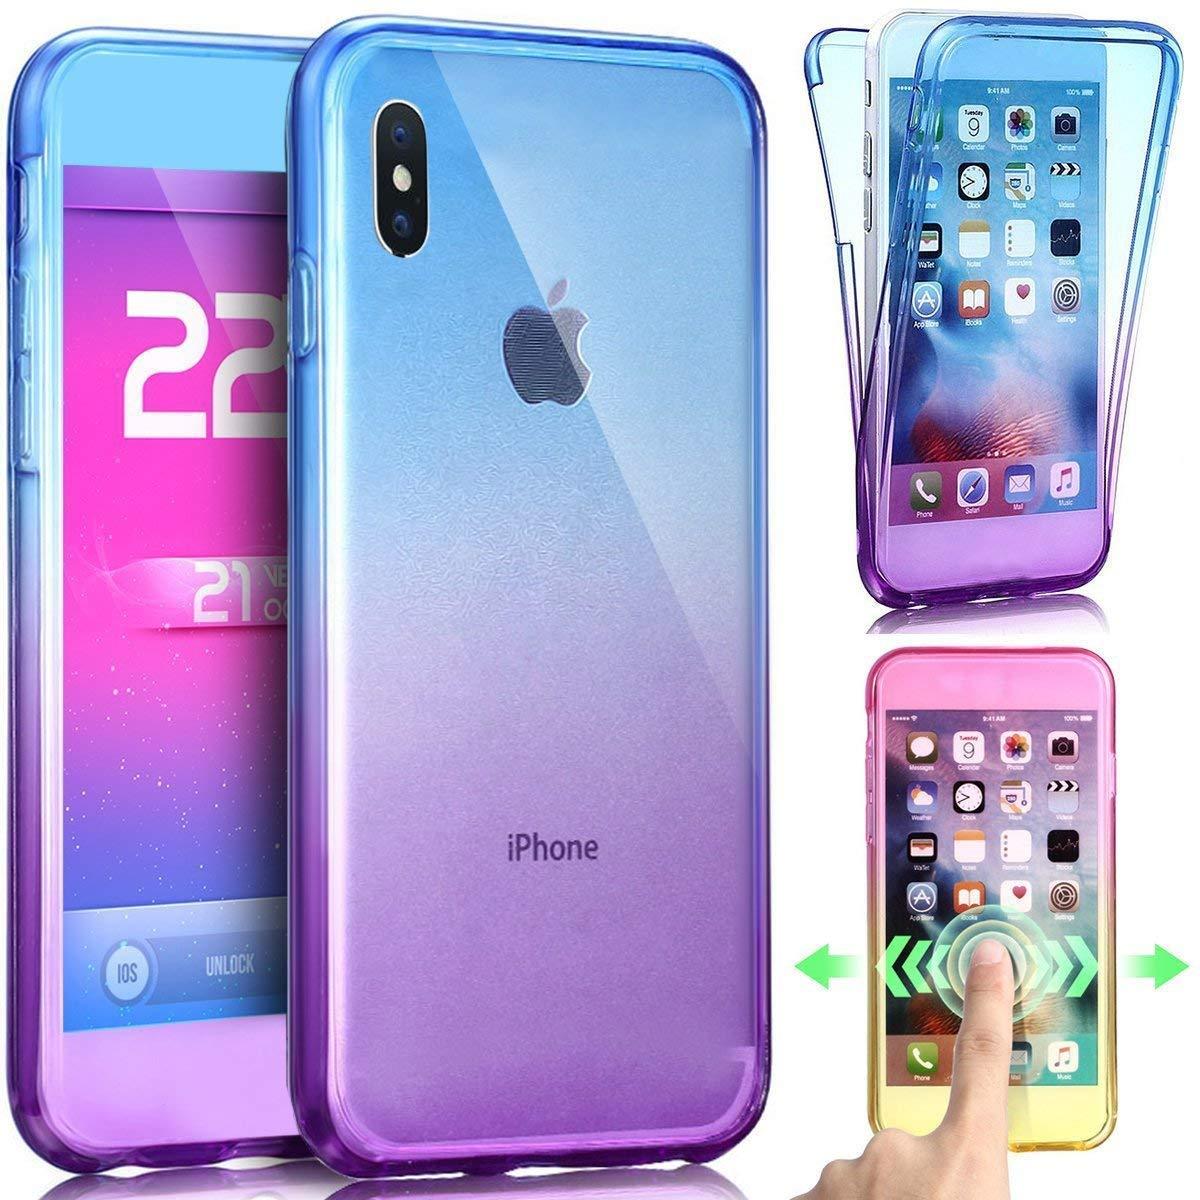 091dbfd9a0f Transparente Silicona Cover Bling Glitter Brillante 360 Grados 3 en 1  Protecció n Ultra Delgado Suave TPU Case Funda Compatible con iPhone XR  Carcasa ...